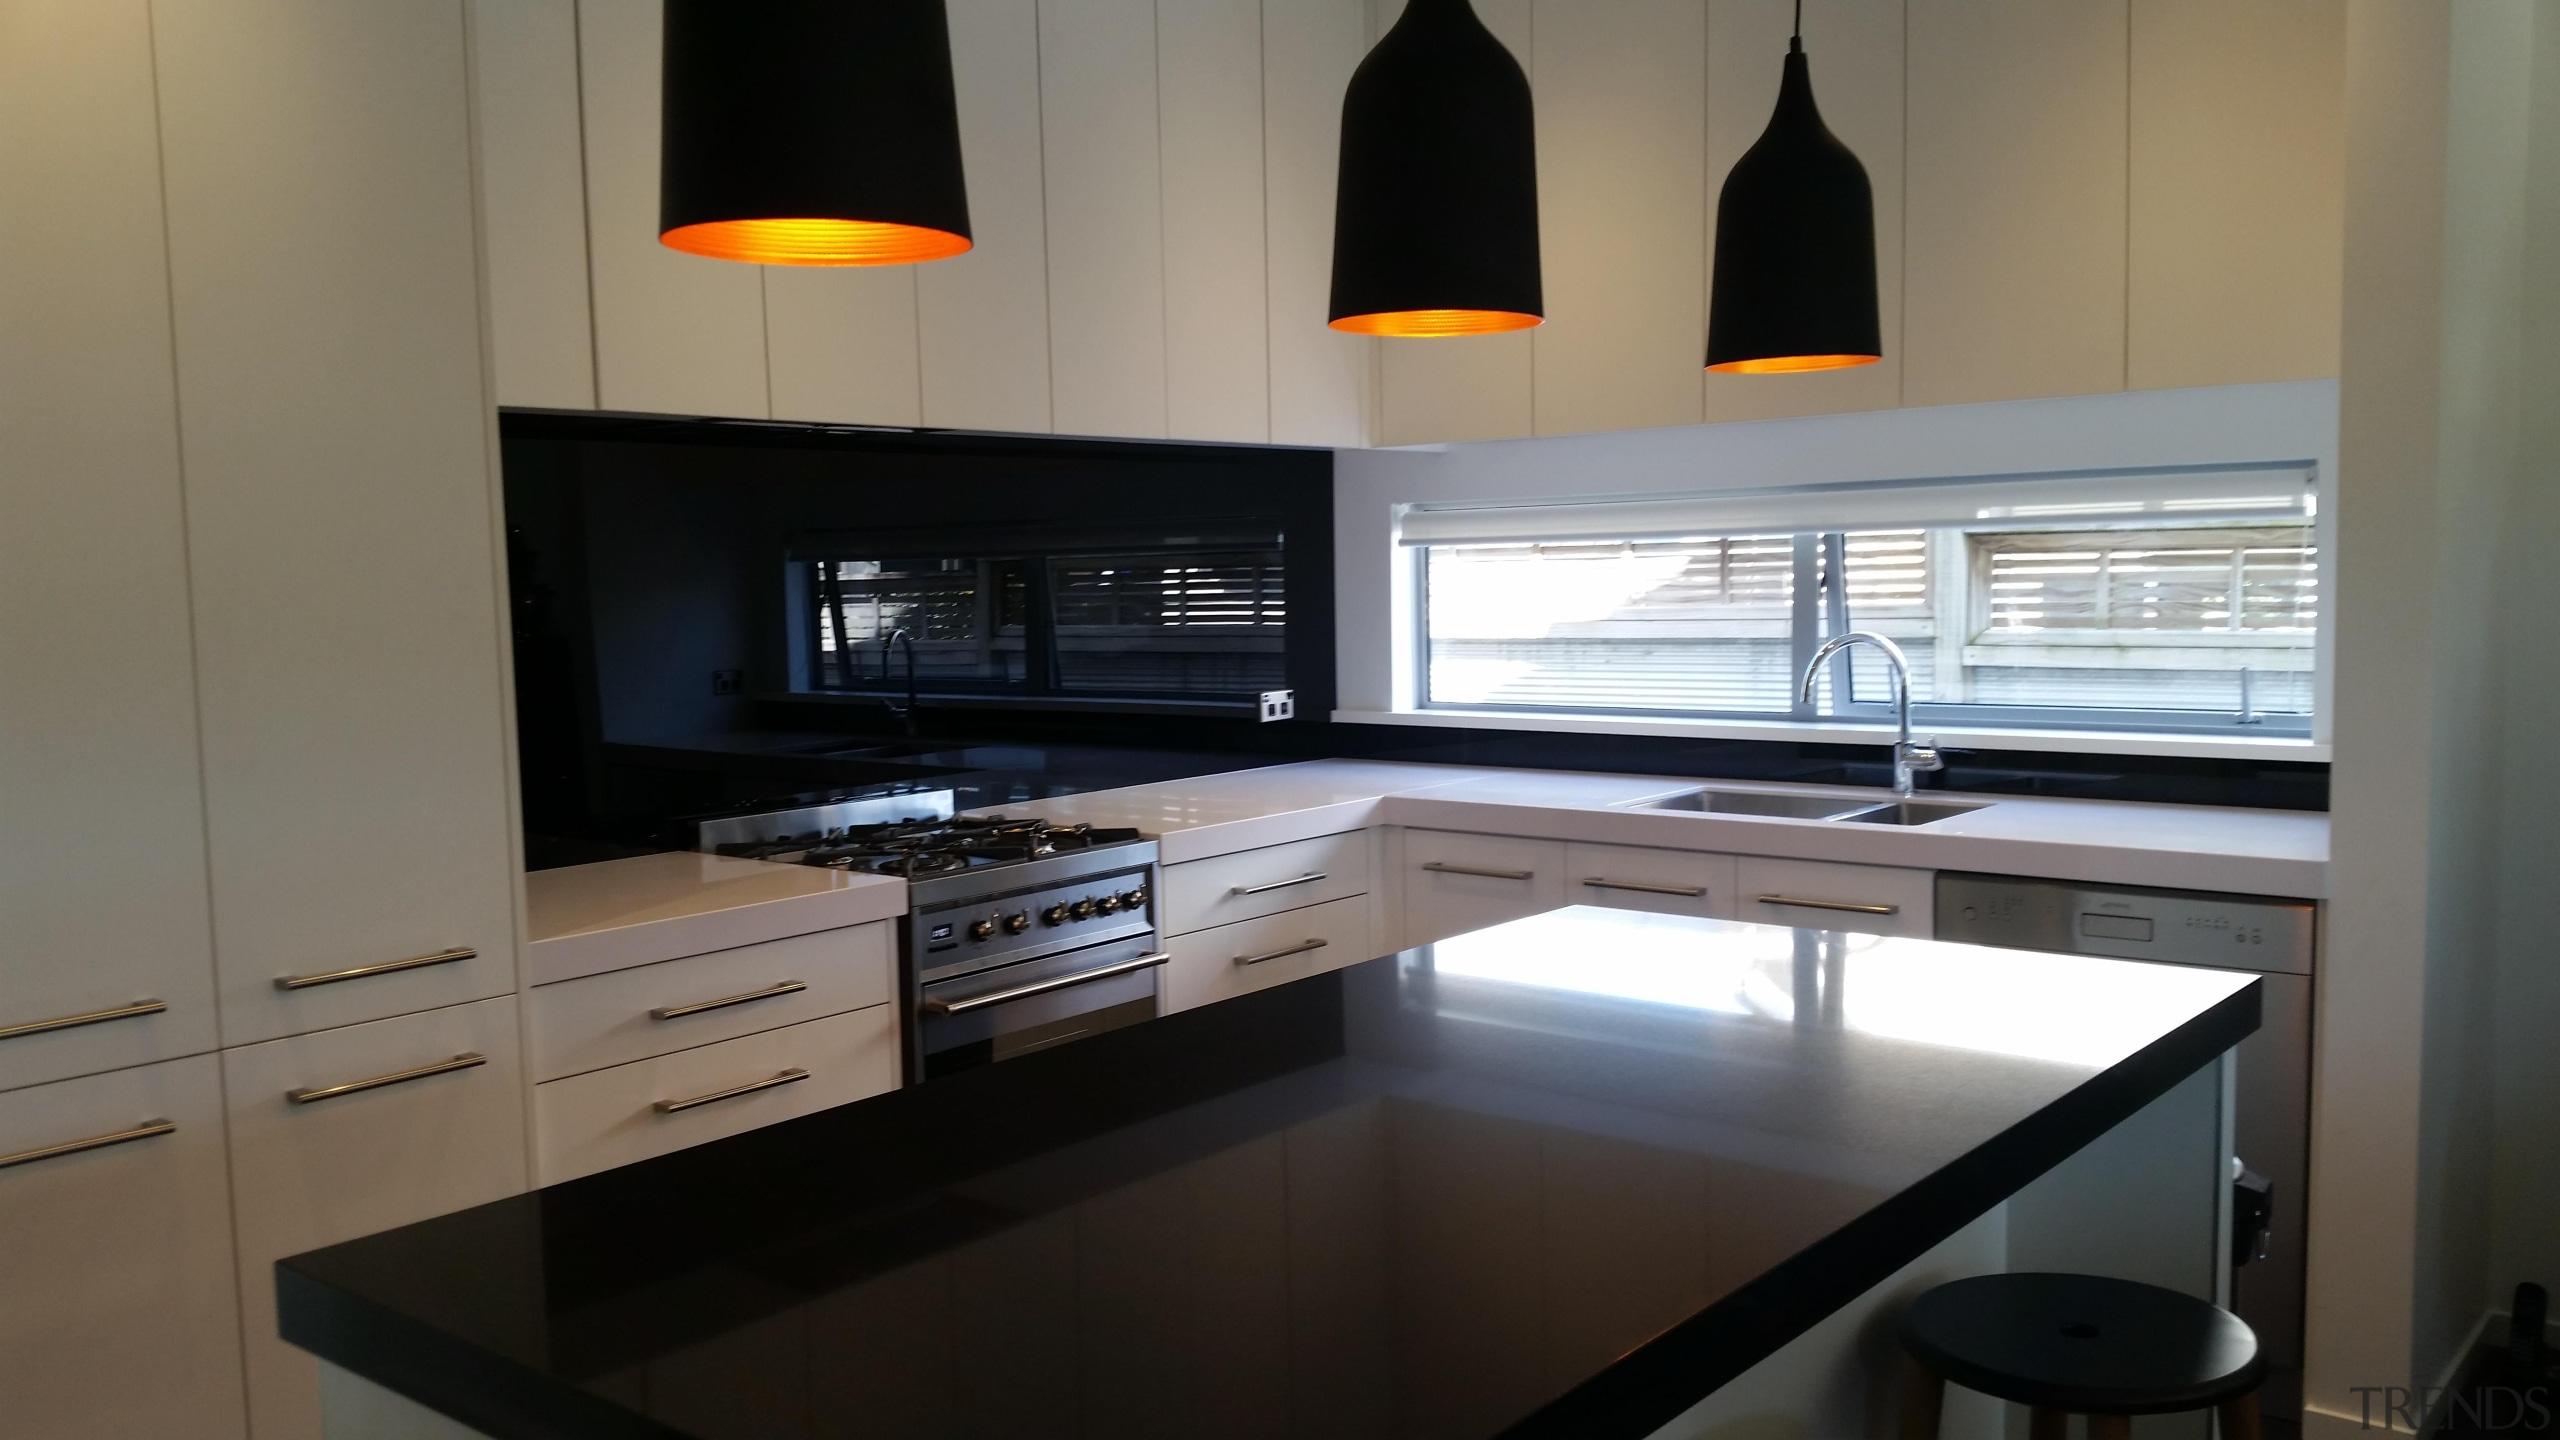 20141219110629.jpg - 20141219110629.jpg - cabinetry | countertop | cabinetry, countertop, interior design, kitchen, room, under cabinet lighting, gray, black